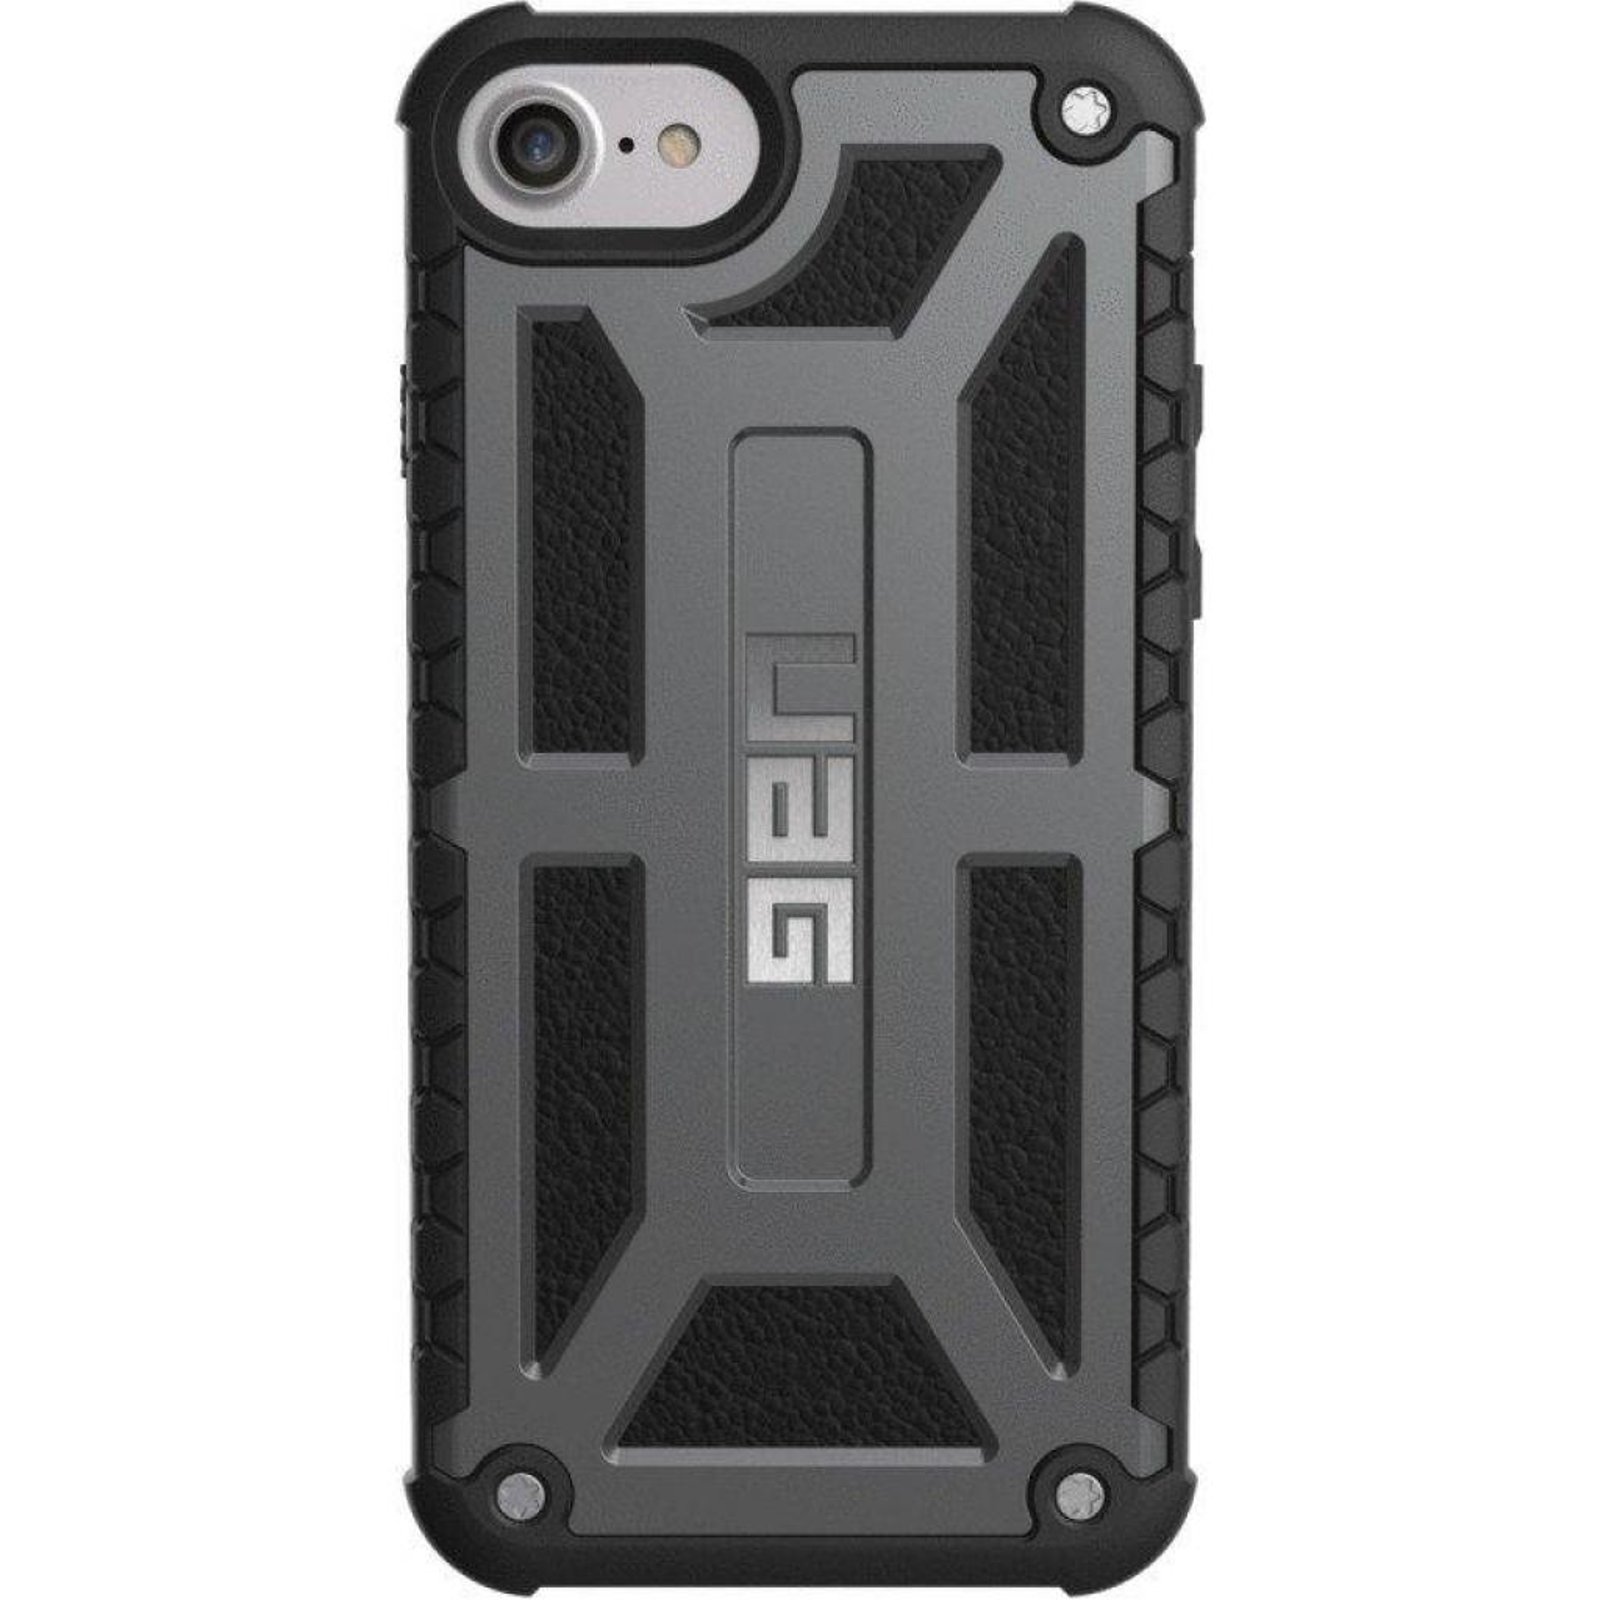 Чехол для моб. телефона Urban Armor Gear iPhone 8/7/6S/6 Monarch Graphite Black (IPH8/7-M-GR)